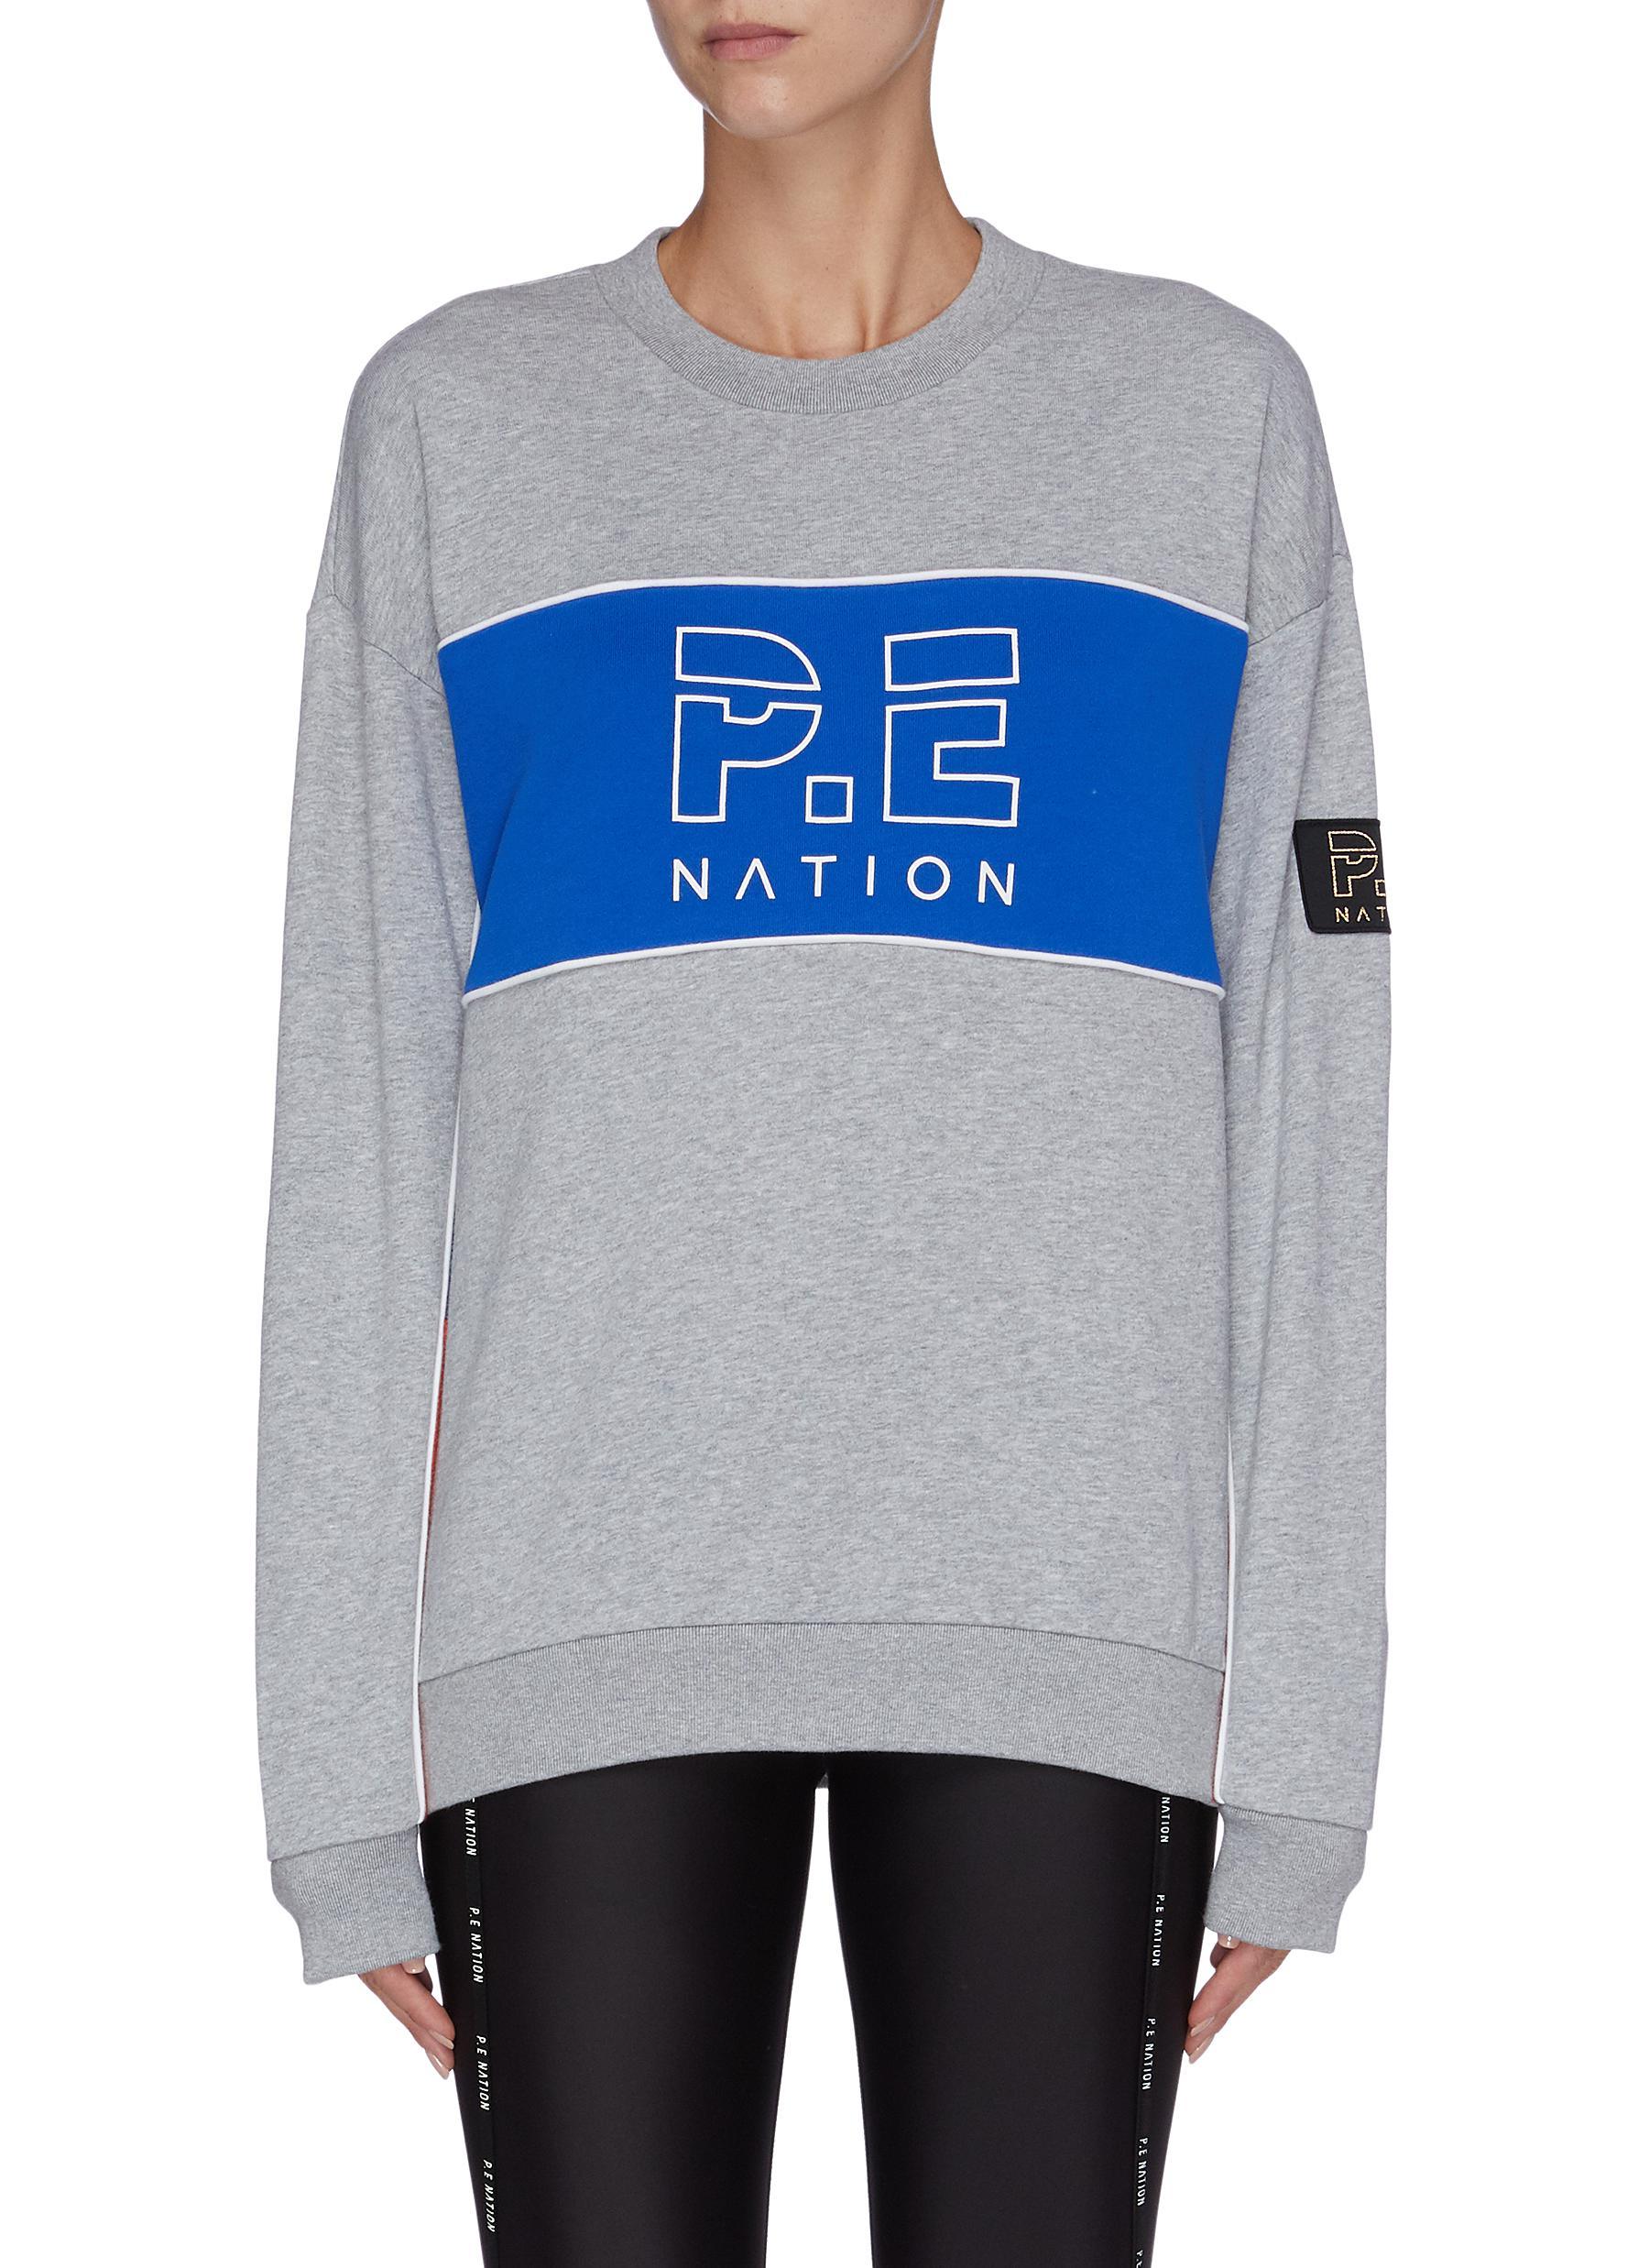 Sonic Boom logo print colourblock panel sweatshirt by P.E Nation